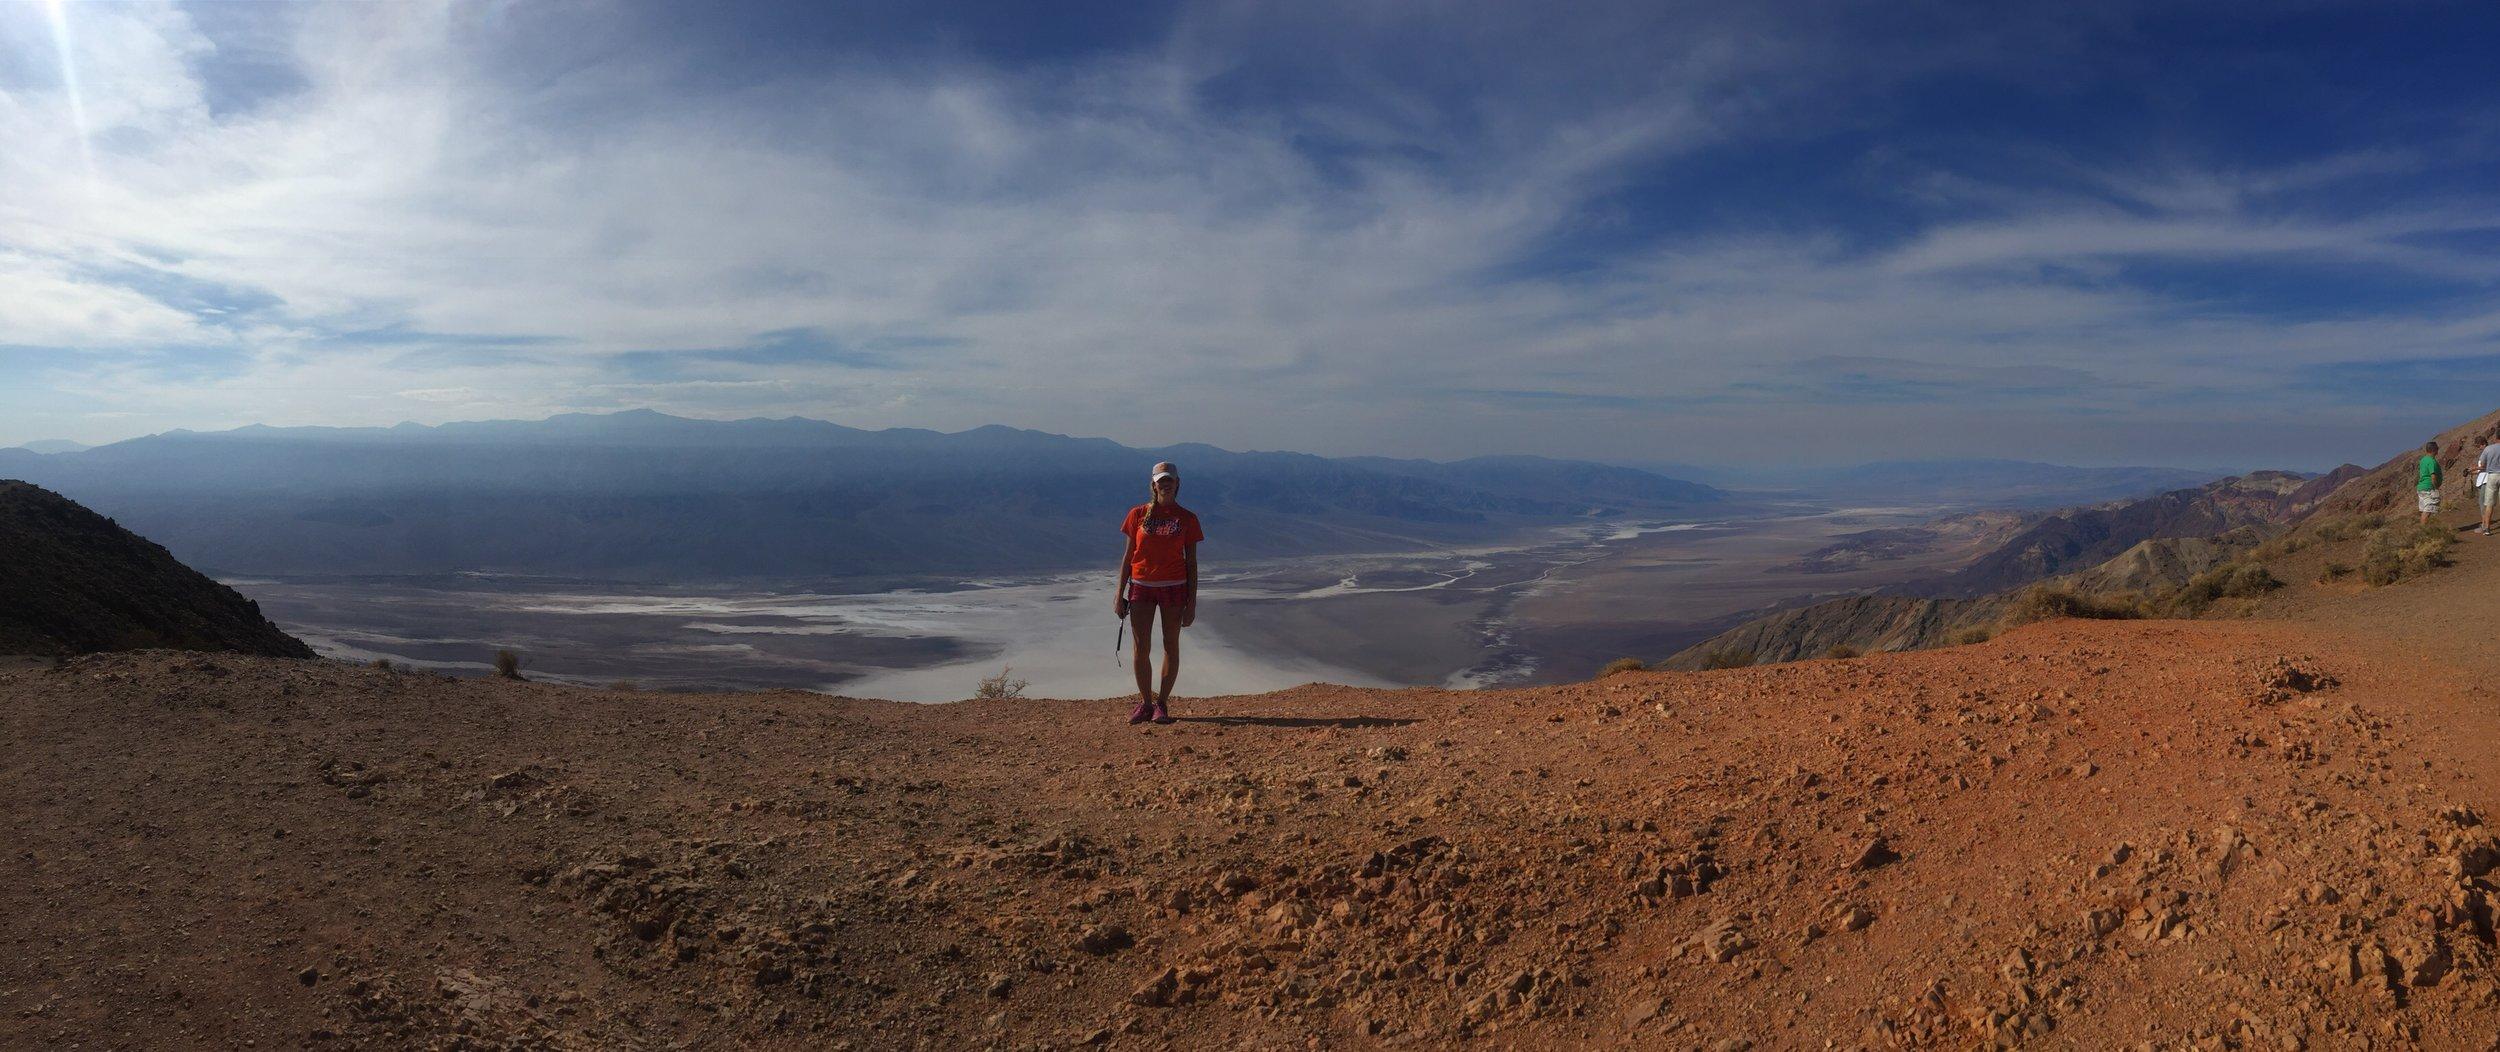 Desert:Death Valley National Park (CA). October, 2017.